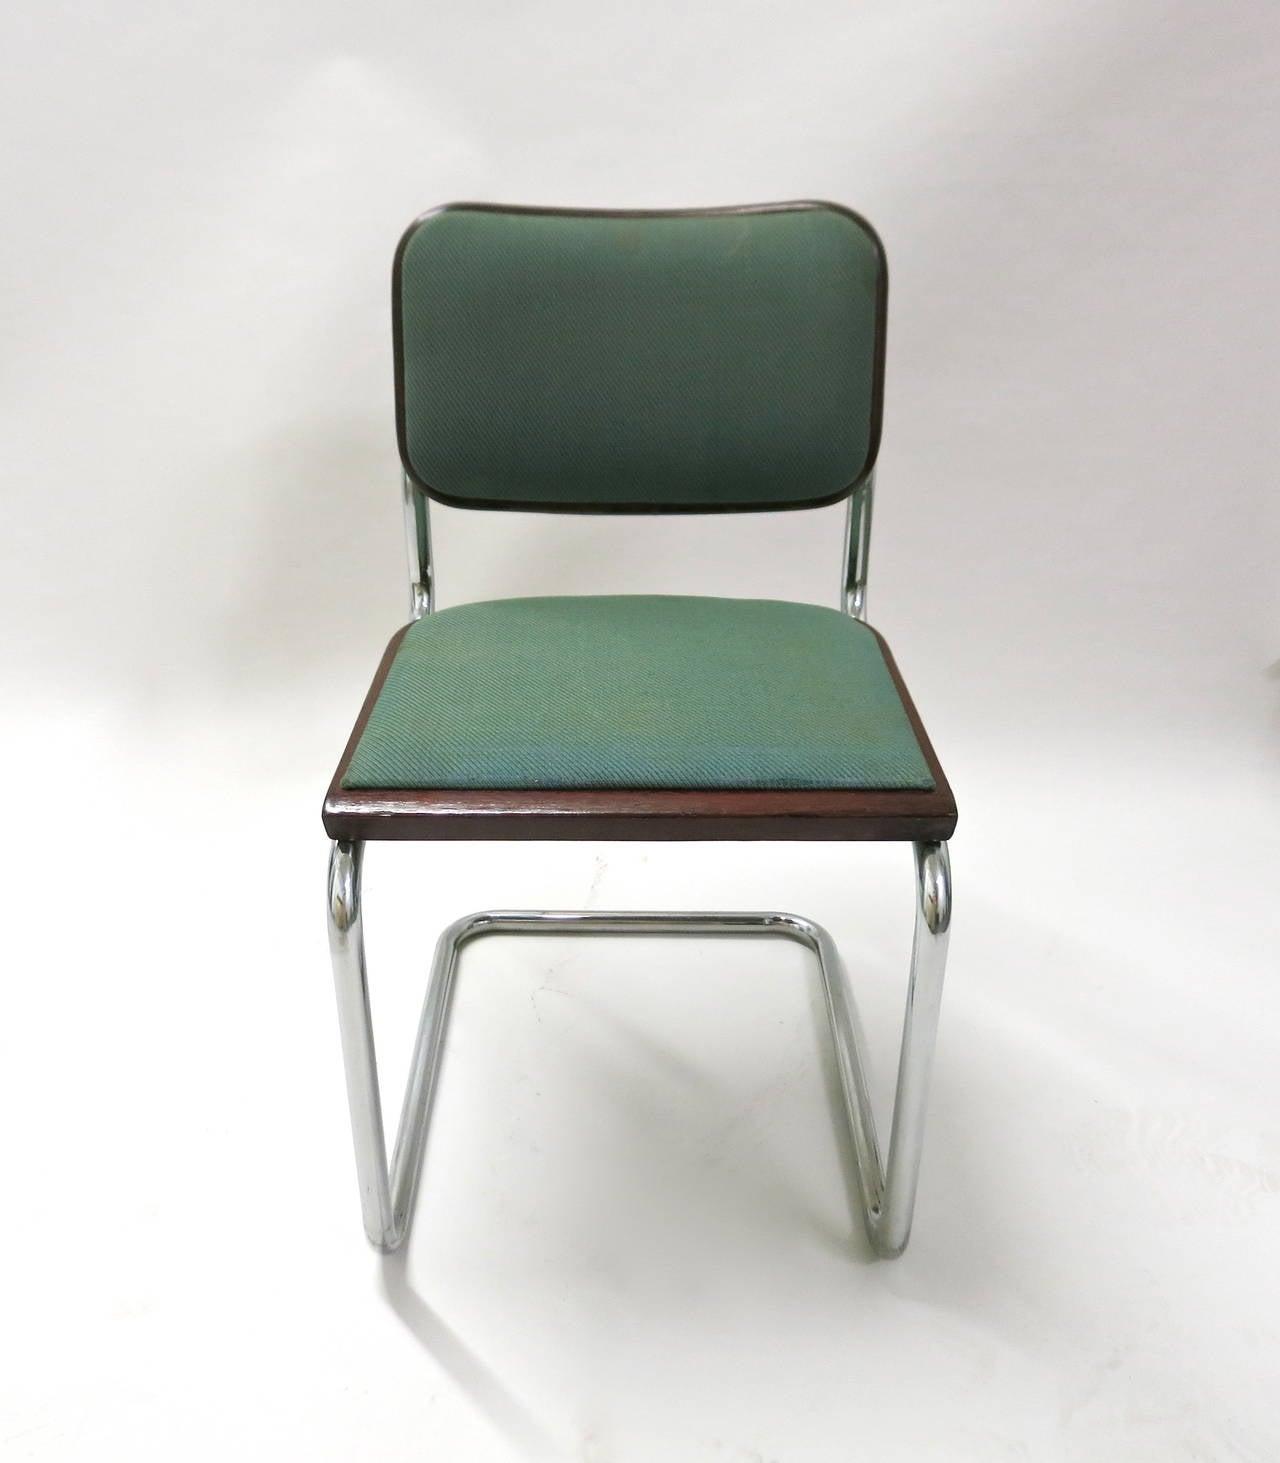 Bauhaus chair breuer - 100 Dining Chairs By Marcel Breuer Bauhaus 1928 Knoll Produced In 1985 2